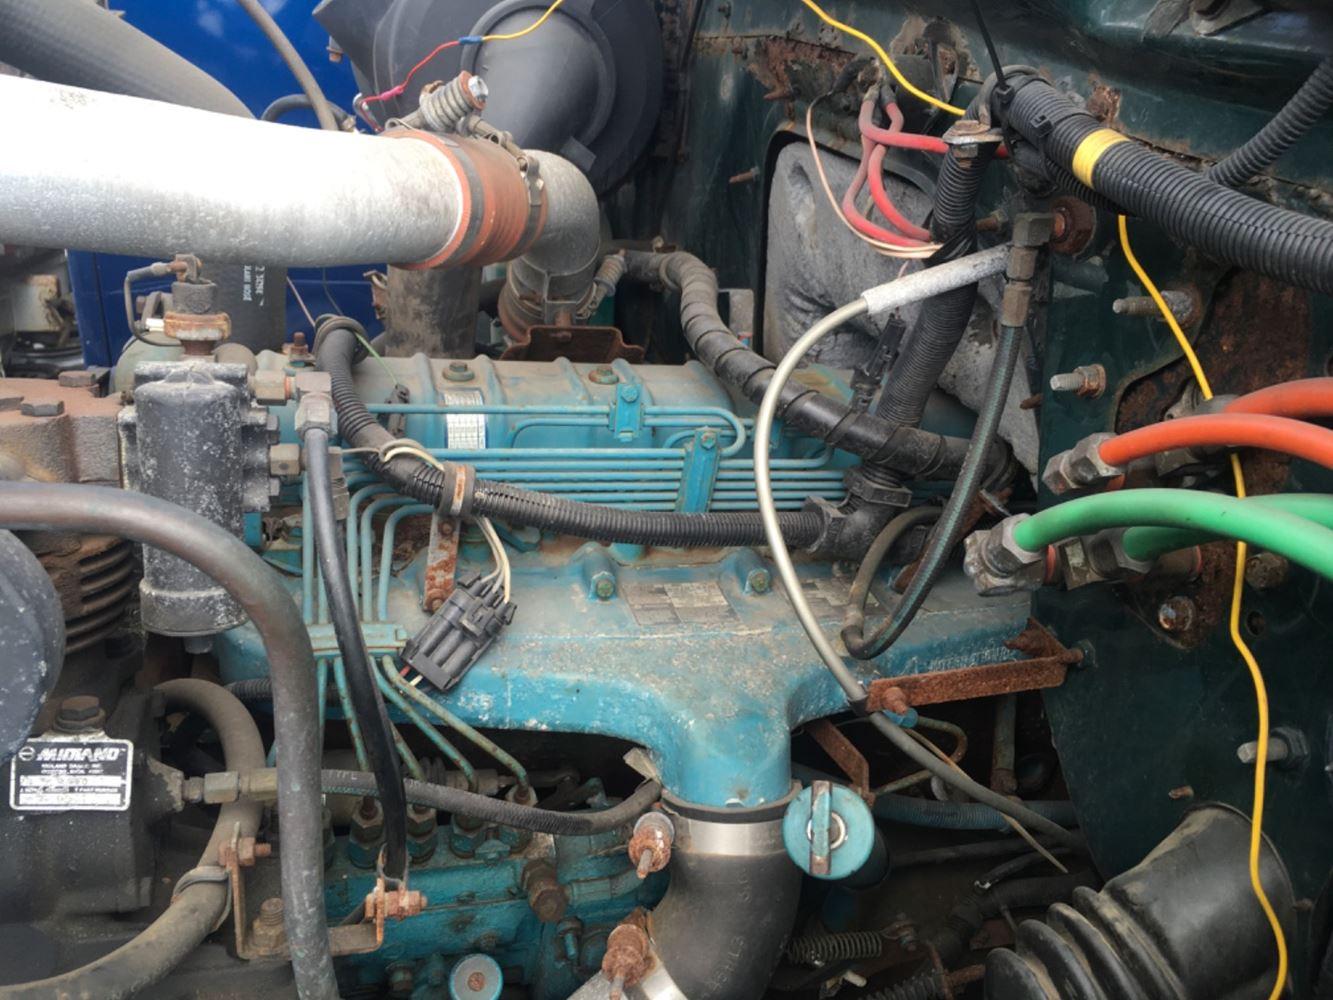 1990 INTERNATIONAL DTA360 ENGINE ASSEMBLY TRUCK PARTS #721124